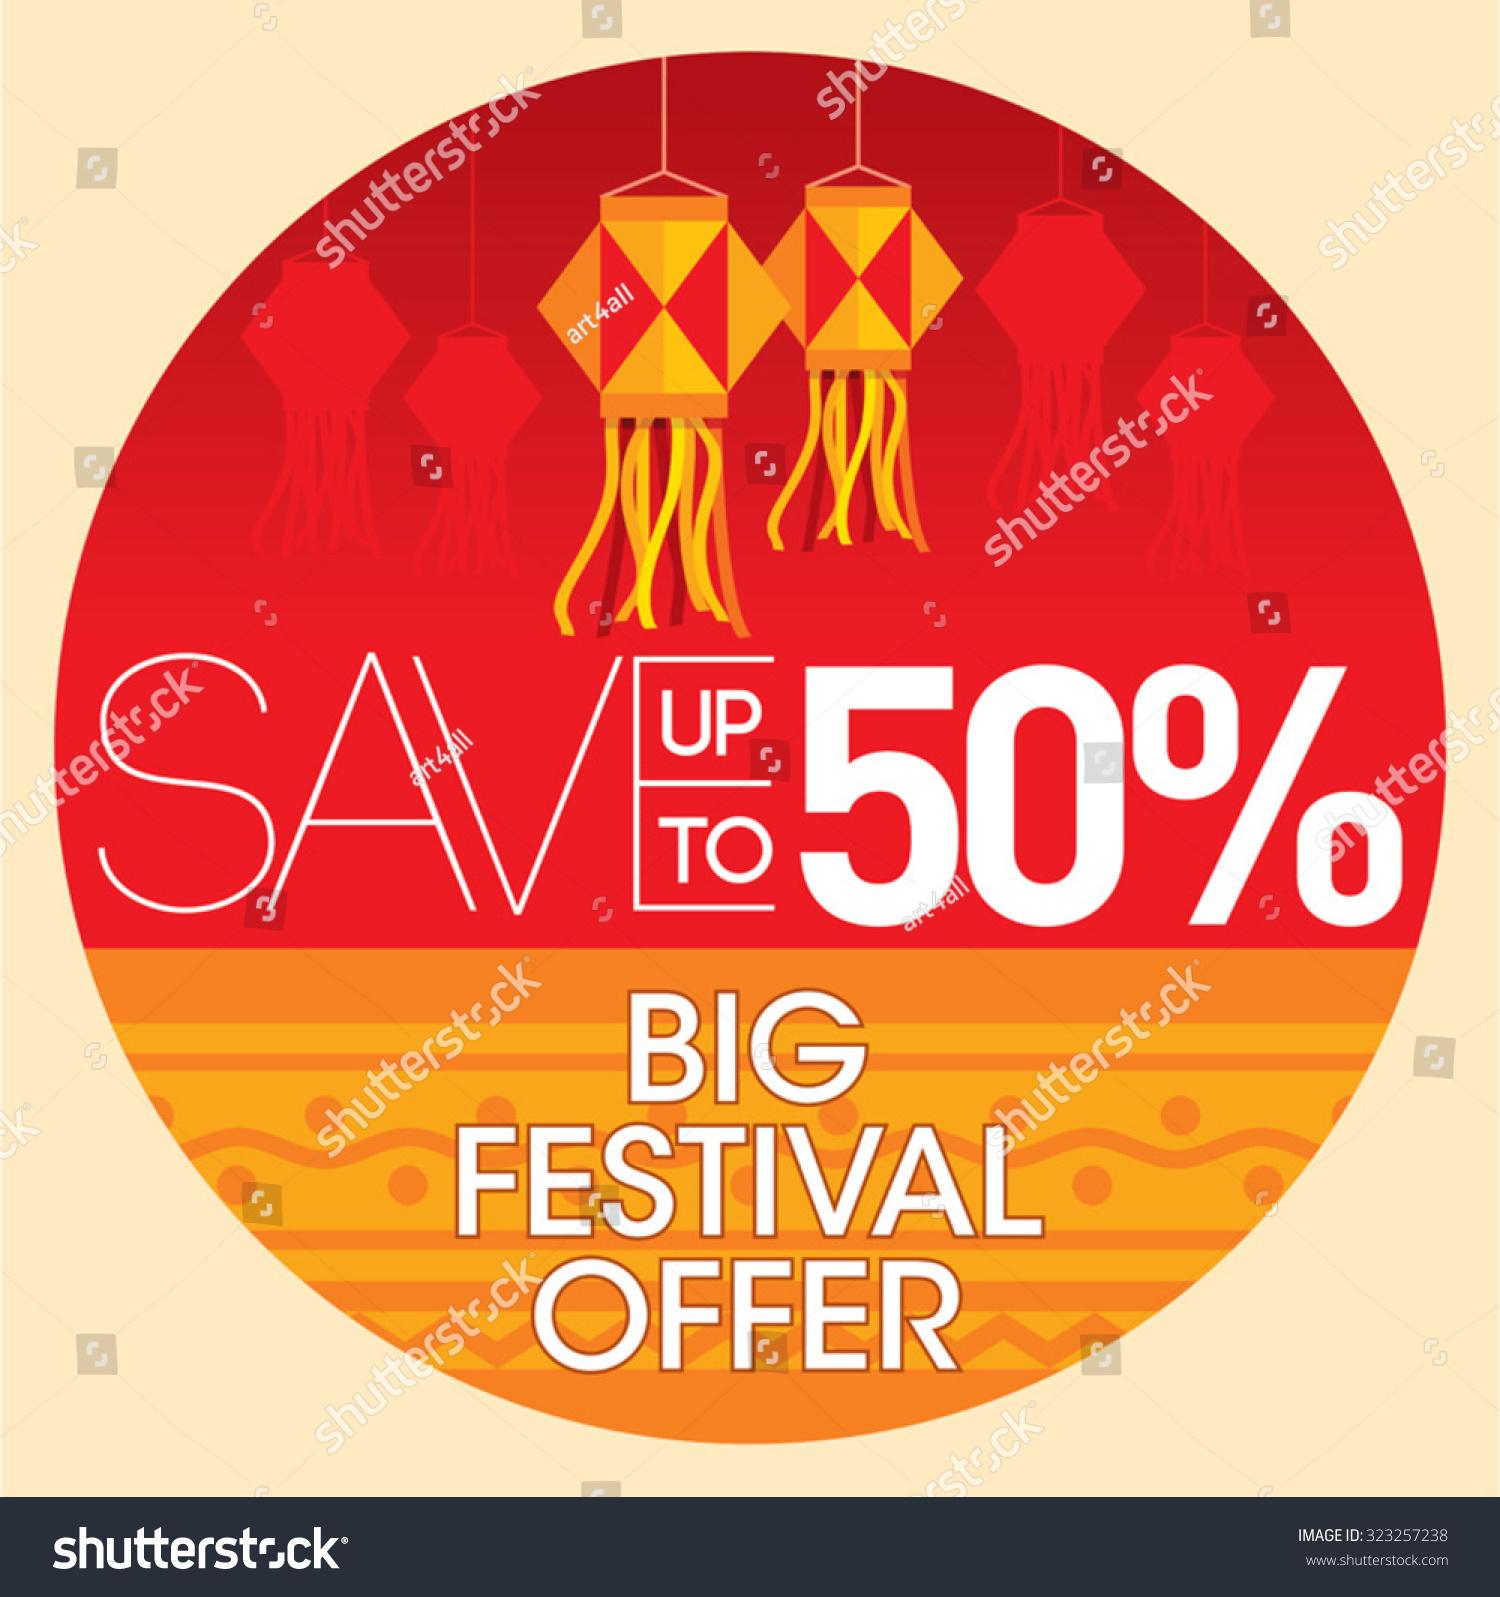 offer poster banner flyer design occasion stock vector 323257238 offer poster banner or flyer design occasion of festival celebrations